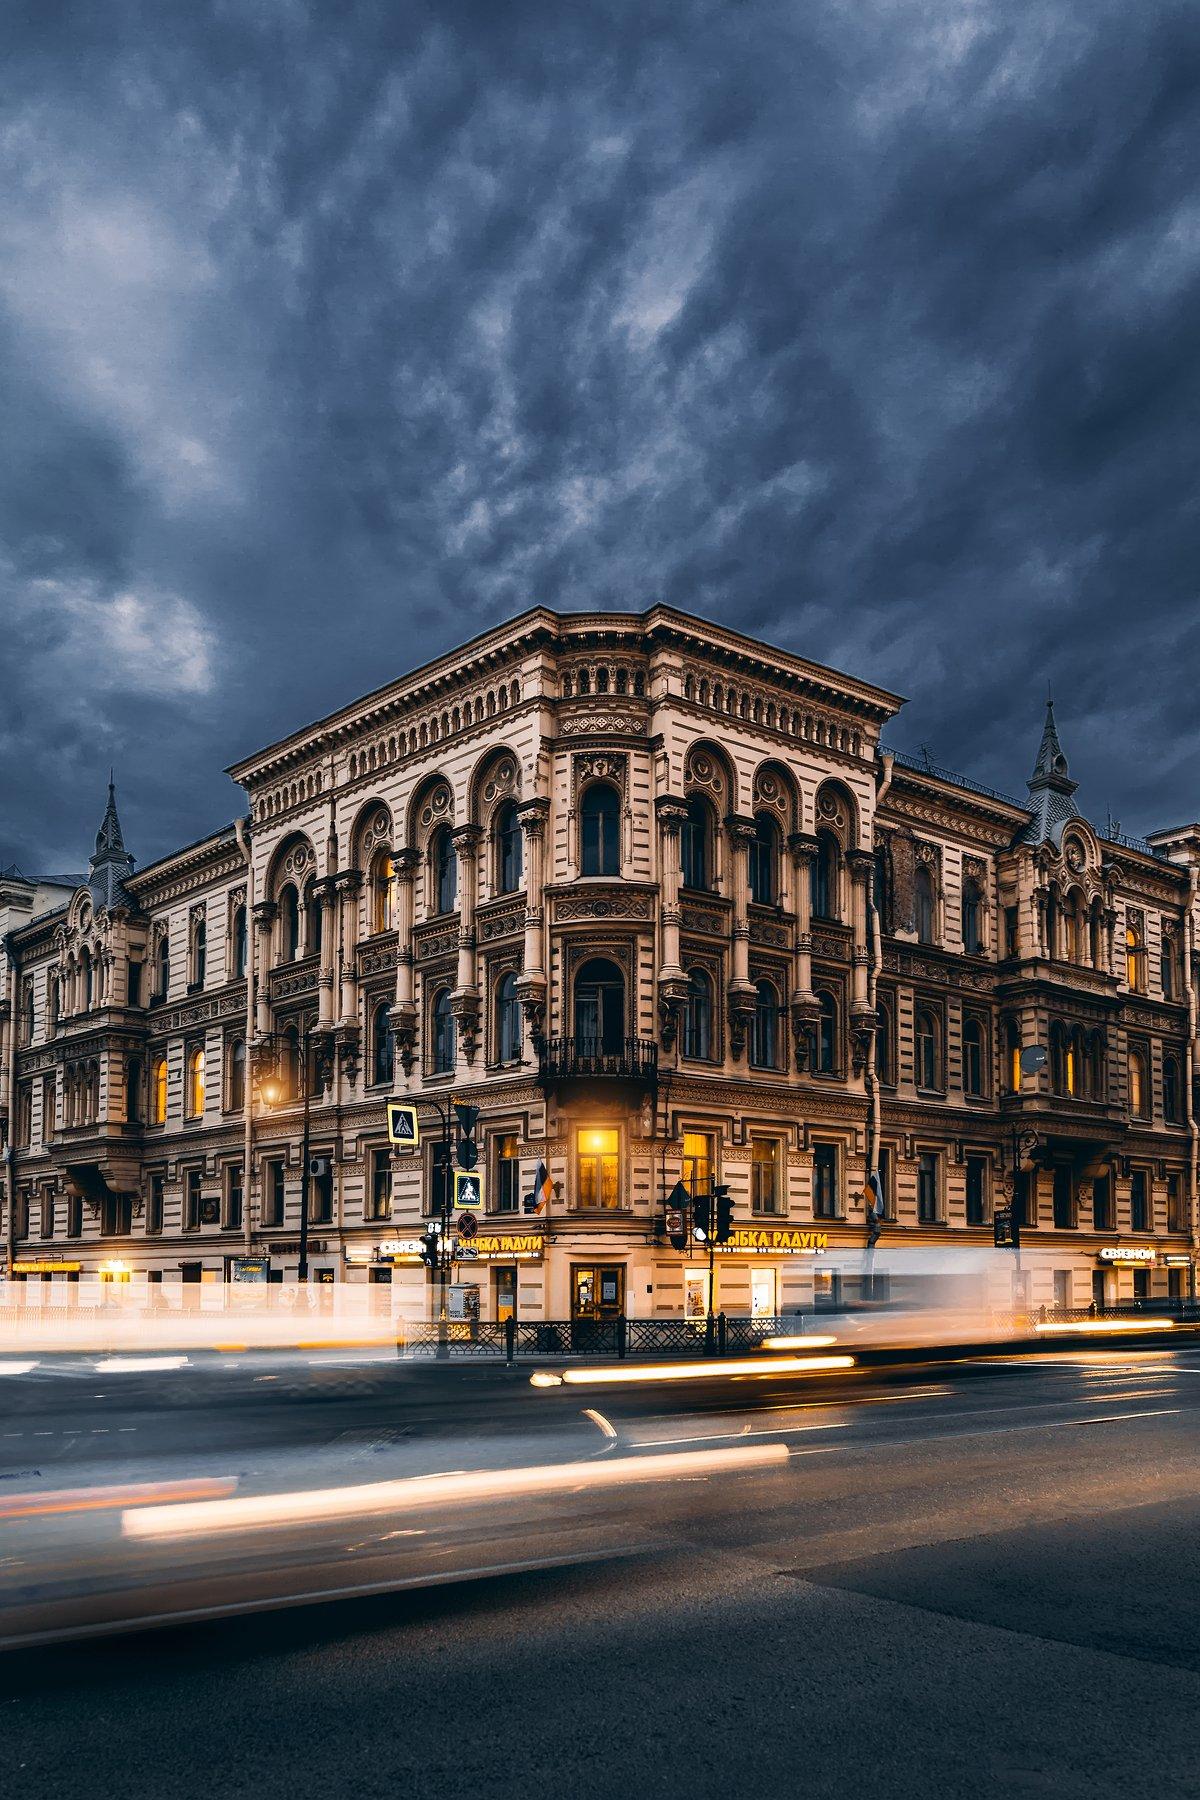 spring, russia, спб, весна, city, sky, небо, город, архитектура, интерьер, Andrei Mikhailov